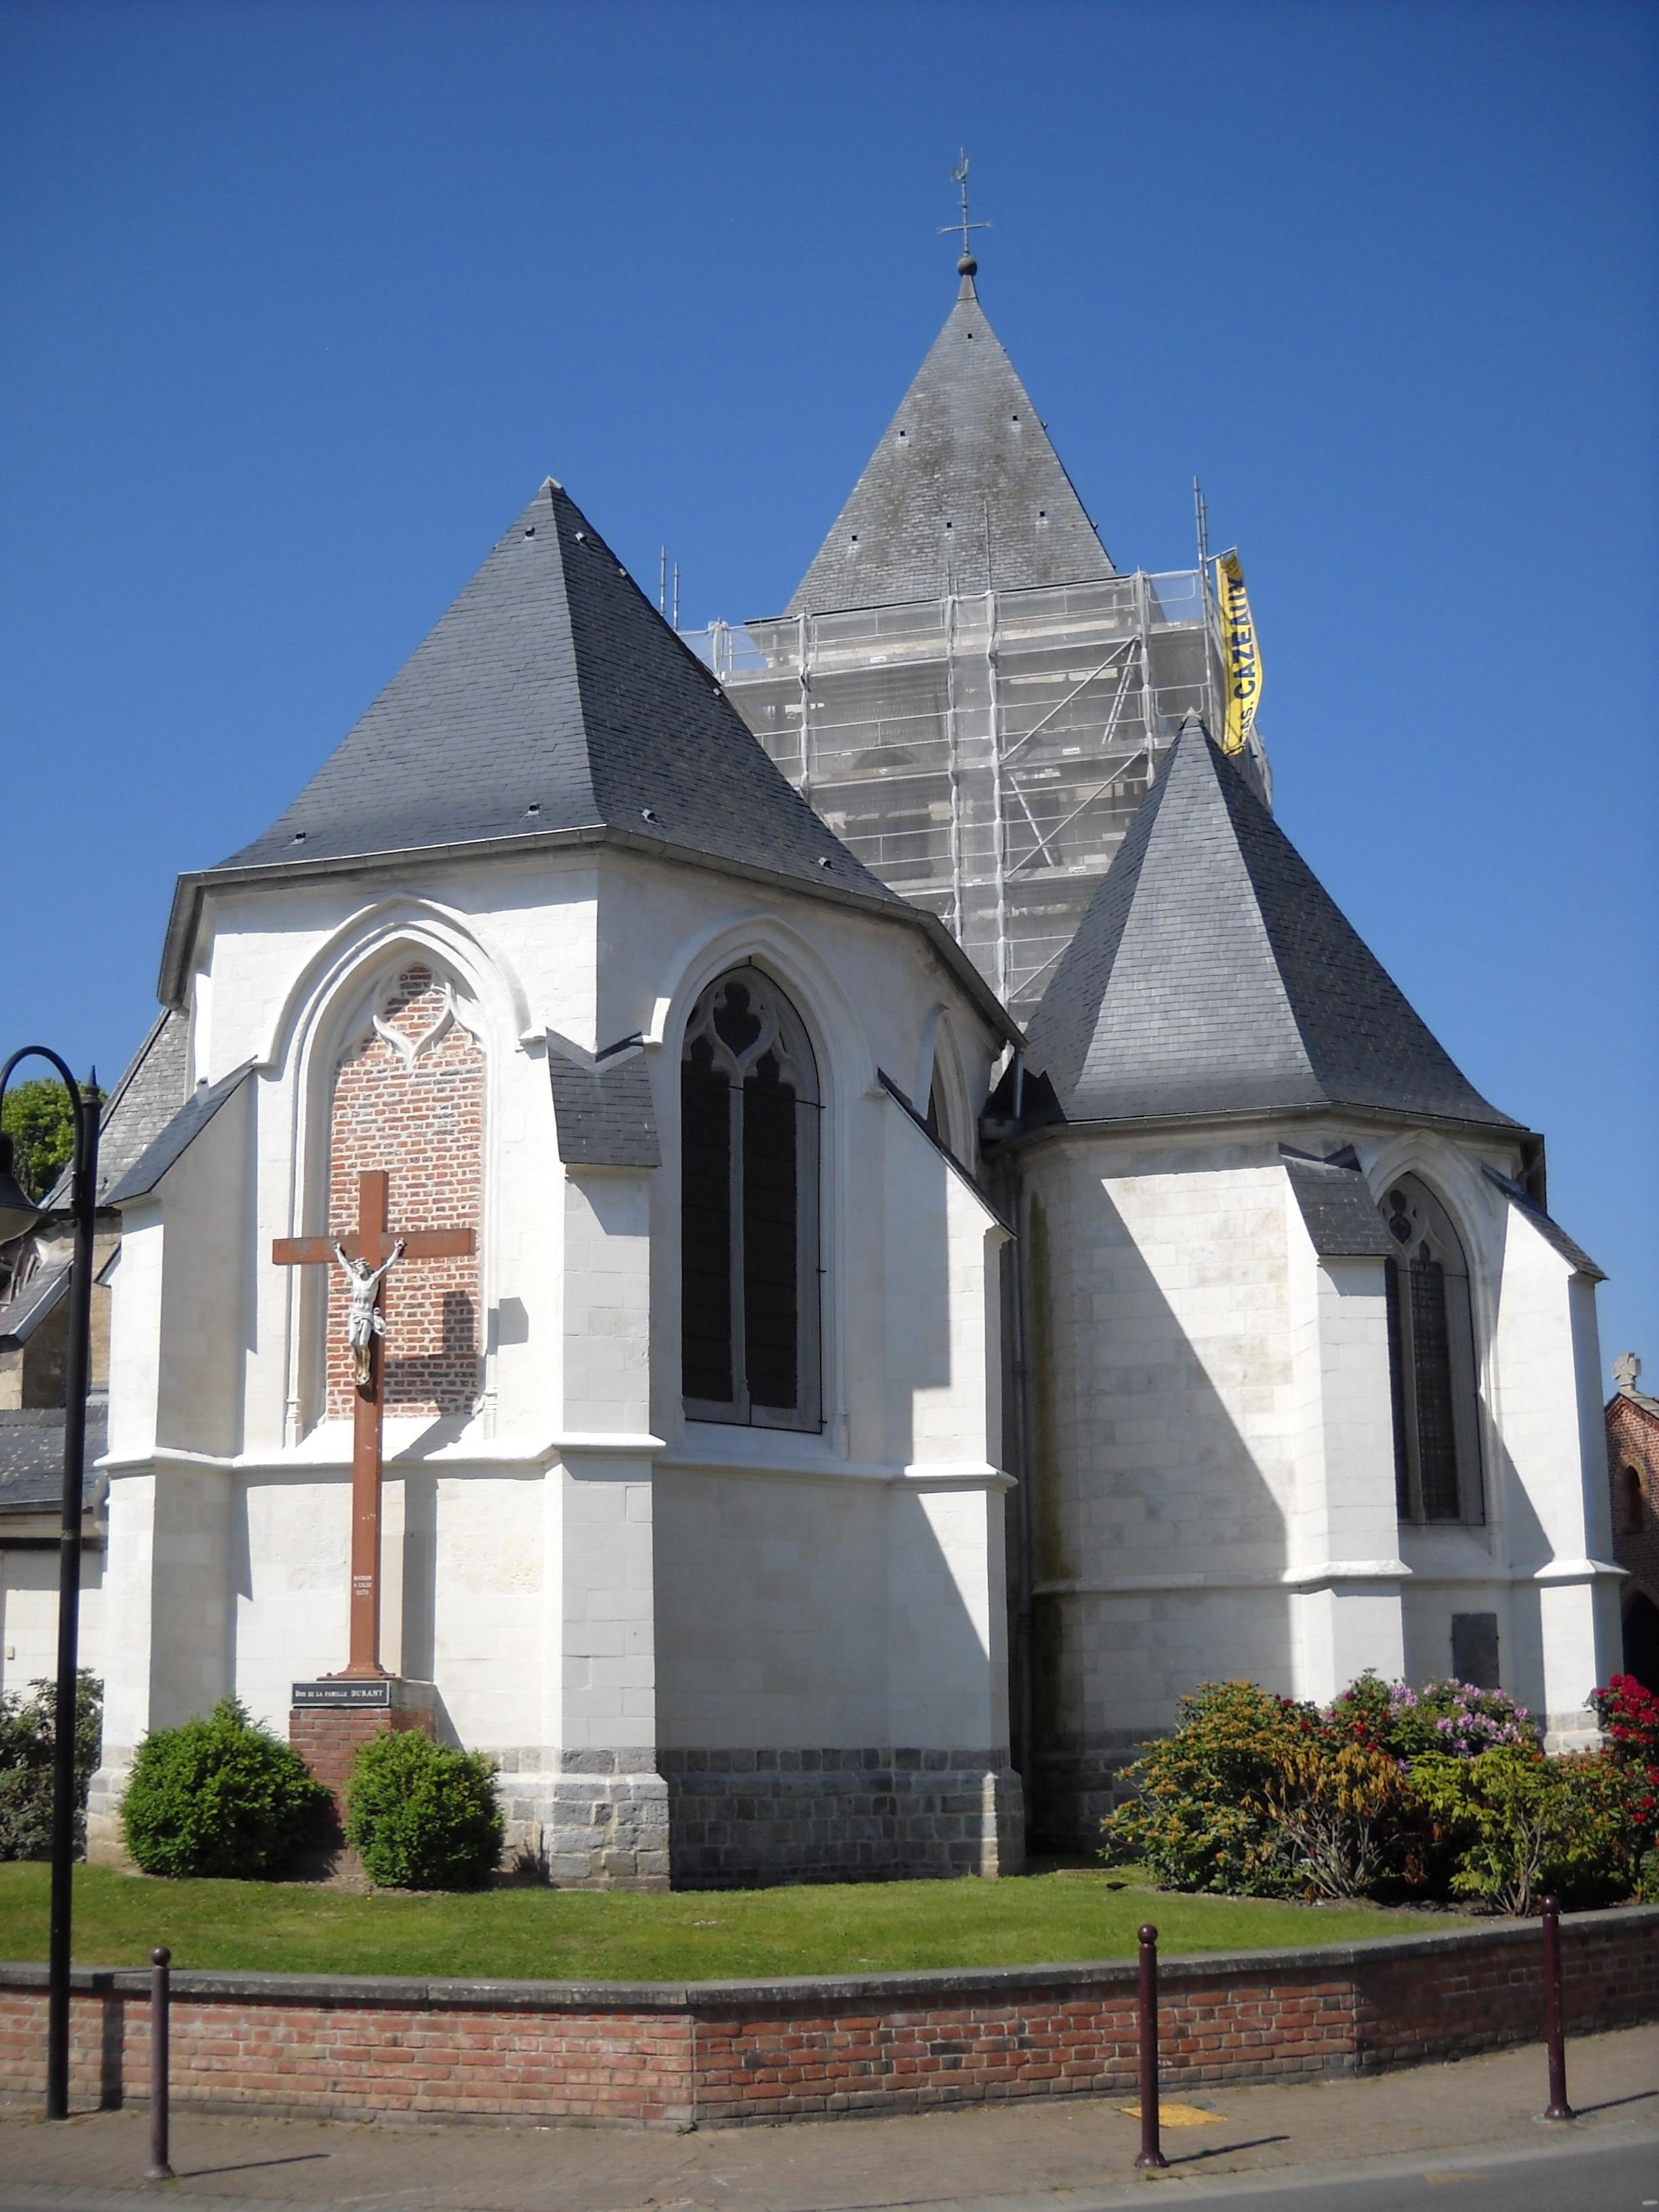 Péronne-en-Mélantois, Nord, France